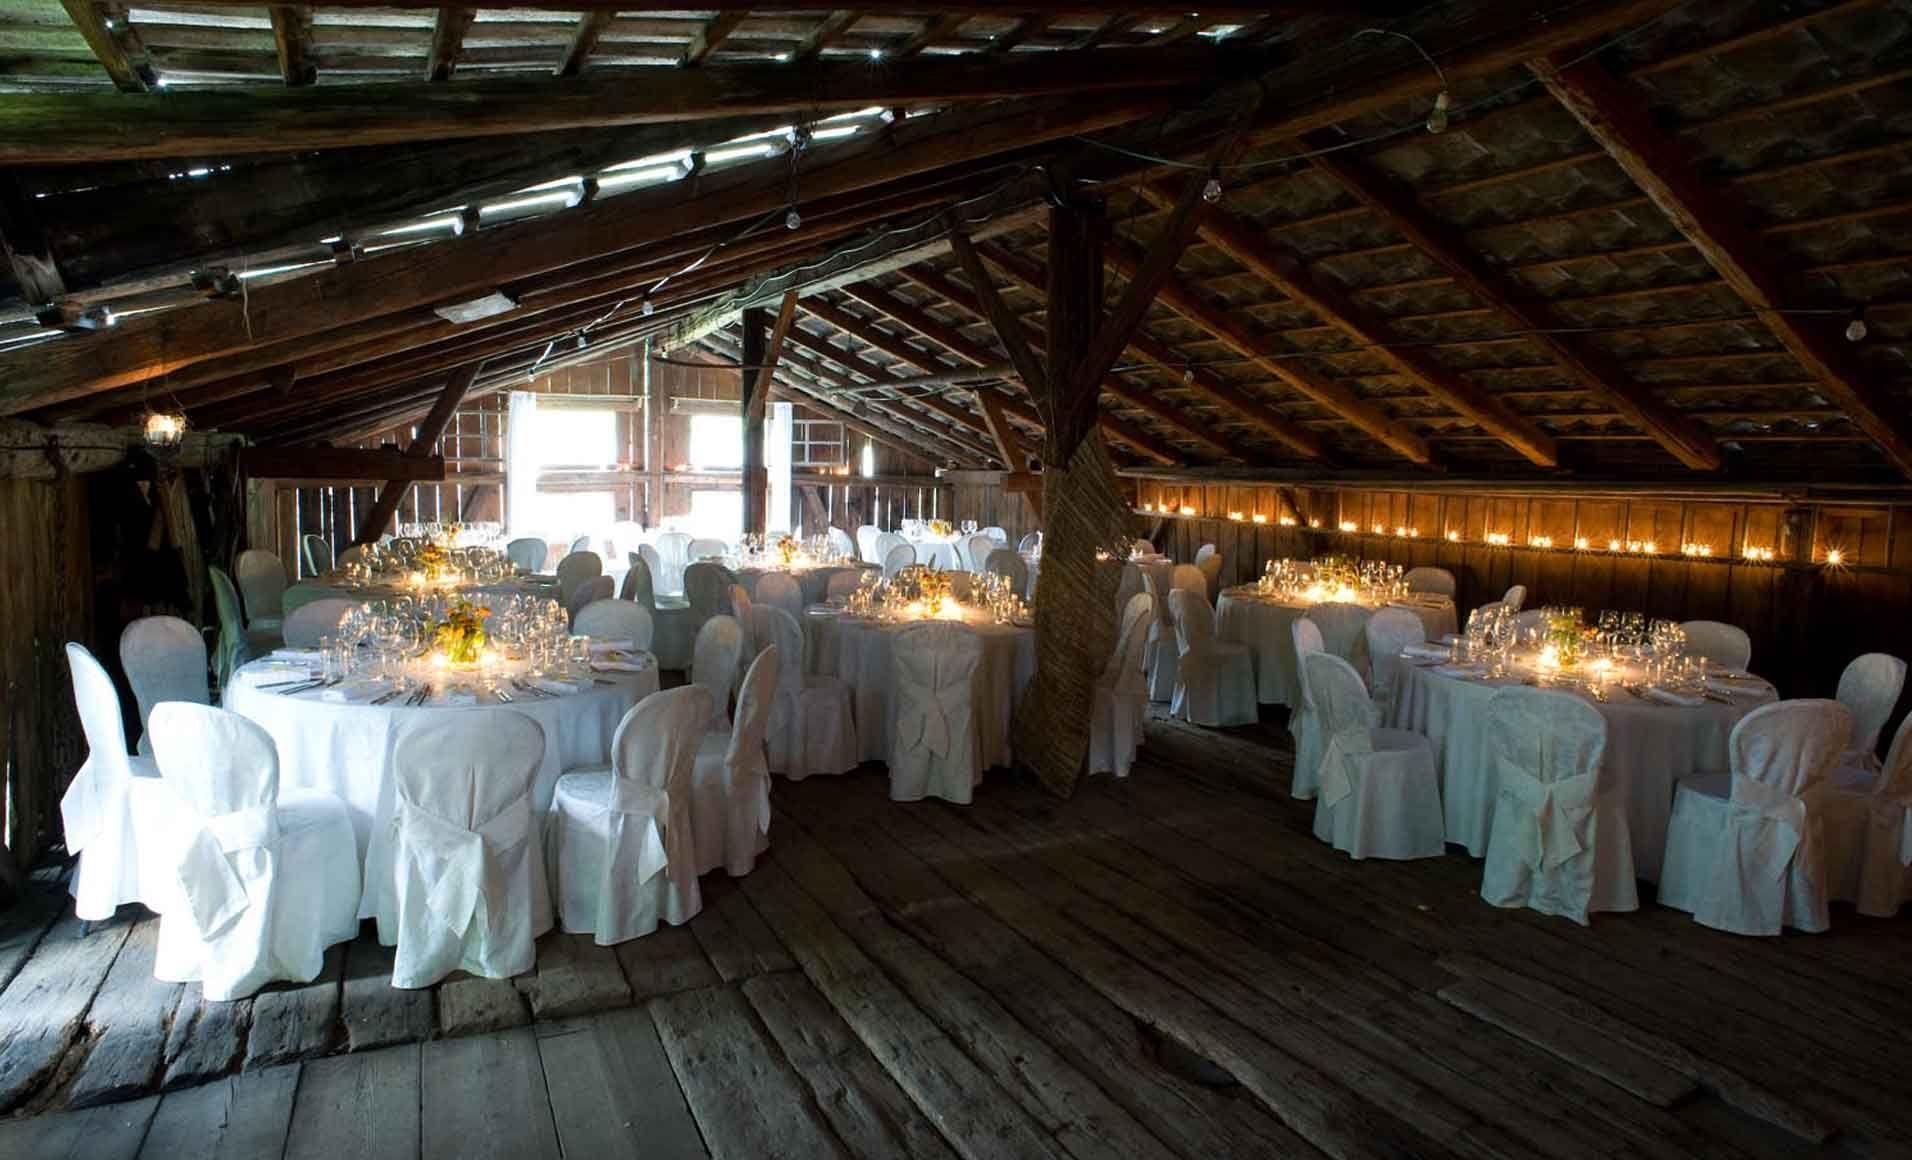 Stadelhochzeit Weddings By Hannah Elia Catering Sudtirol Italien Alto Adige Italy Dolomites Bozen